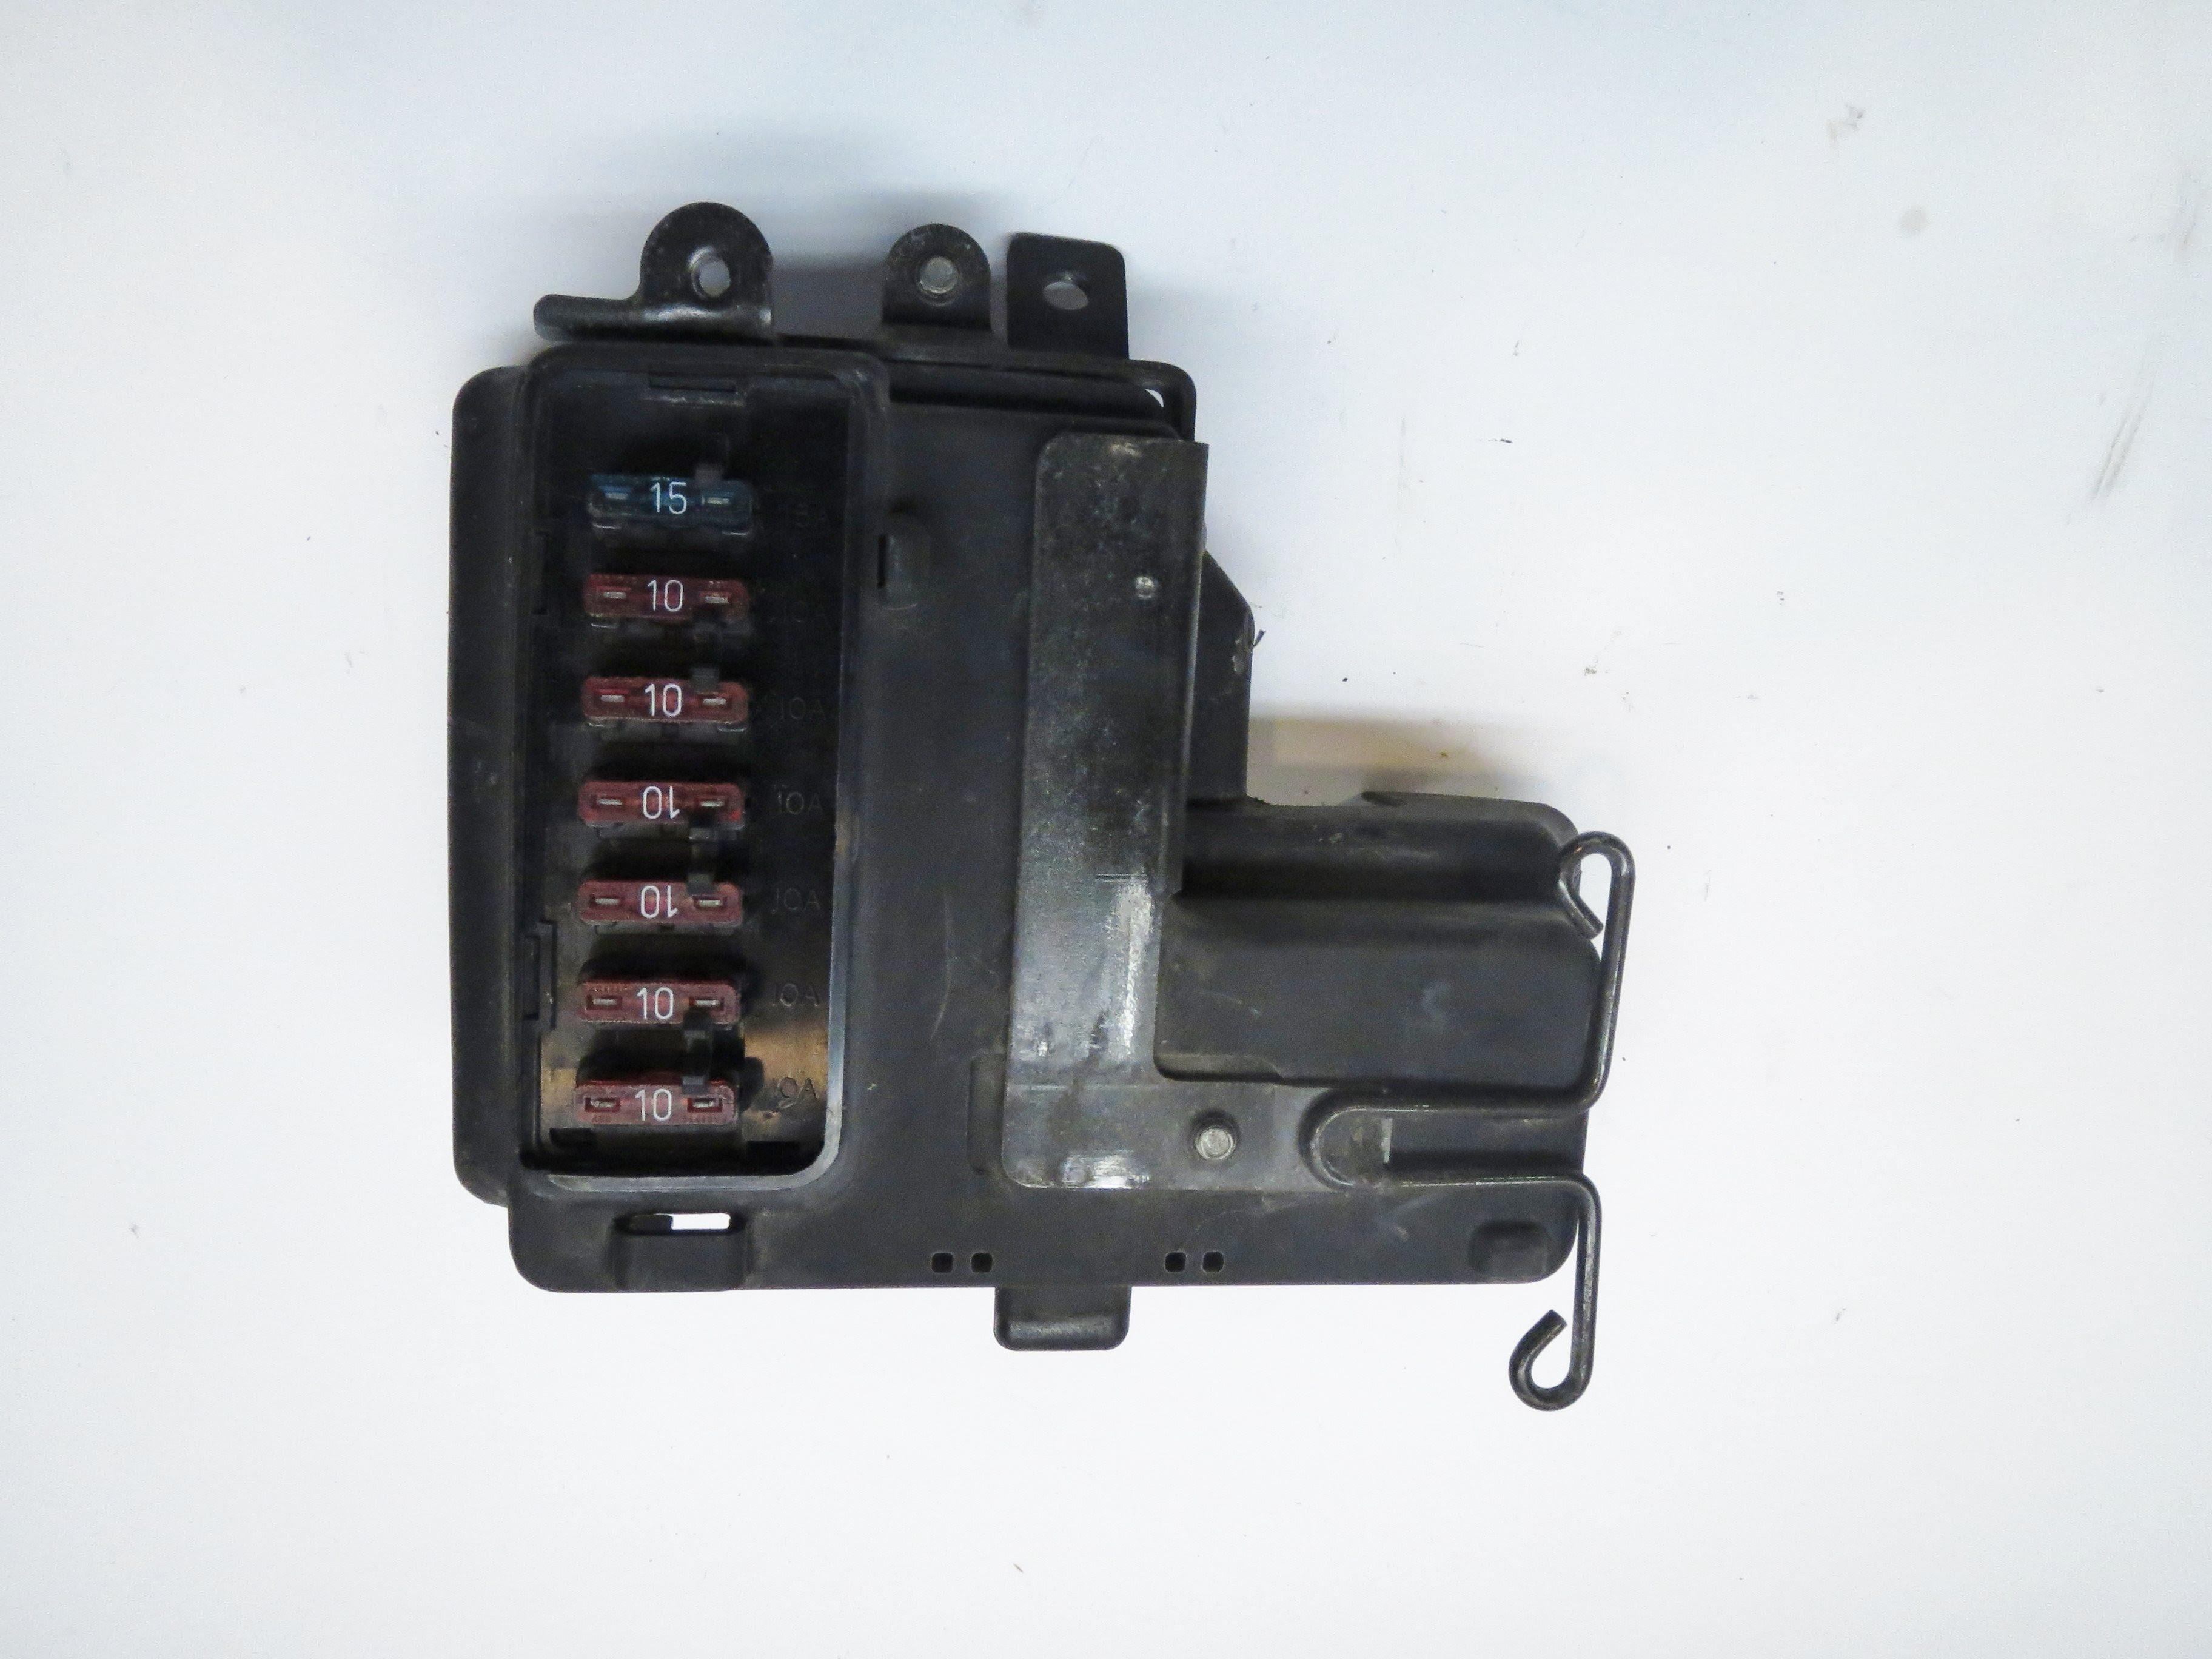 Fuse Box Honda Shadow 750 Gm Wiring Diagrams Oxygen Sensor Wiring For Dummies Computer Fron 1982dodge Sampwire Jeanjaures37 Fr